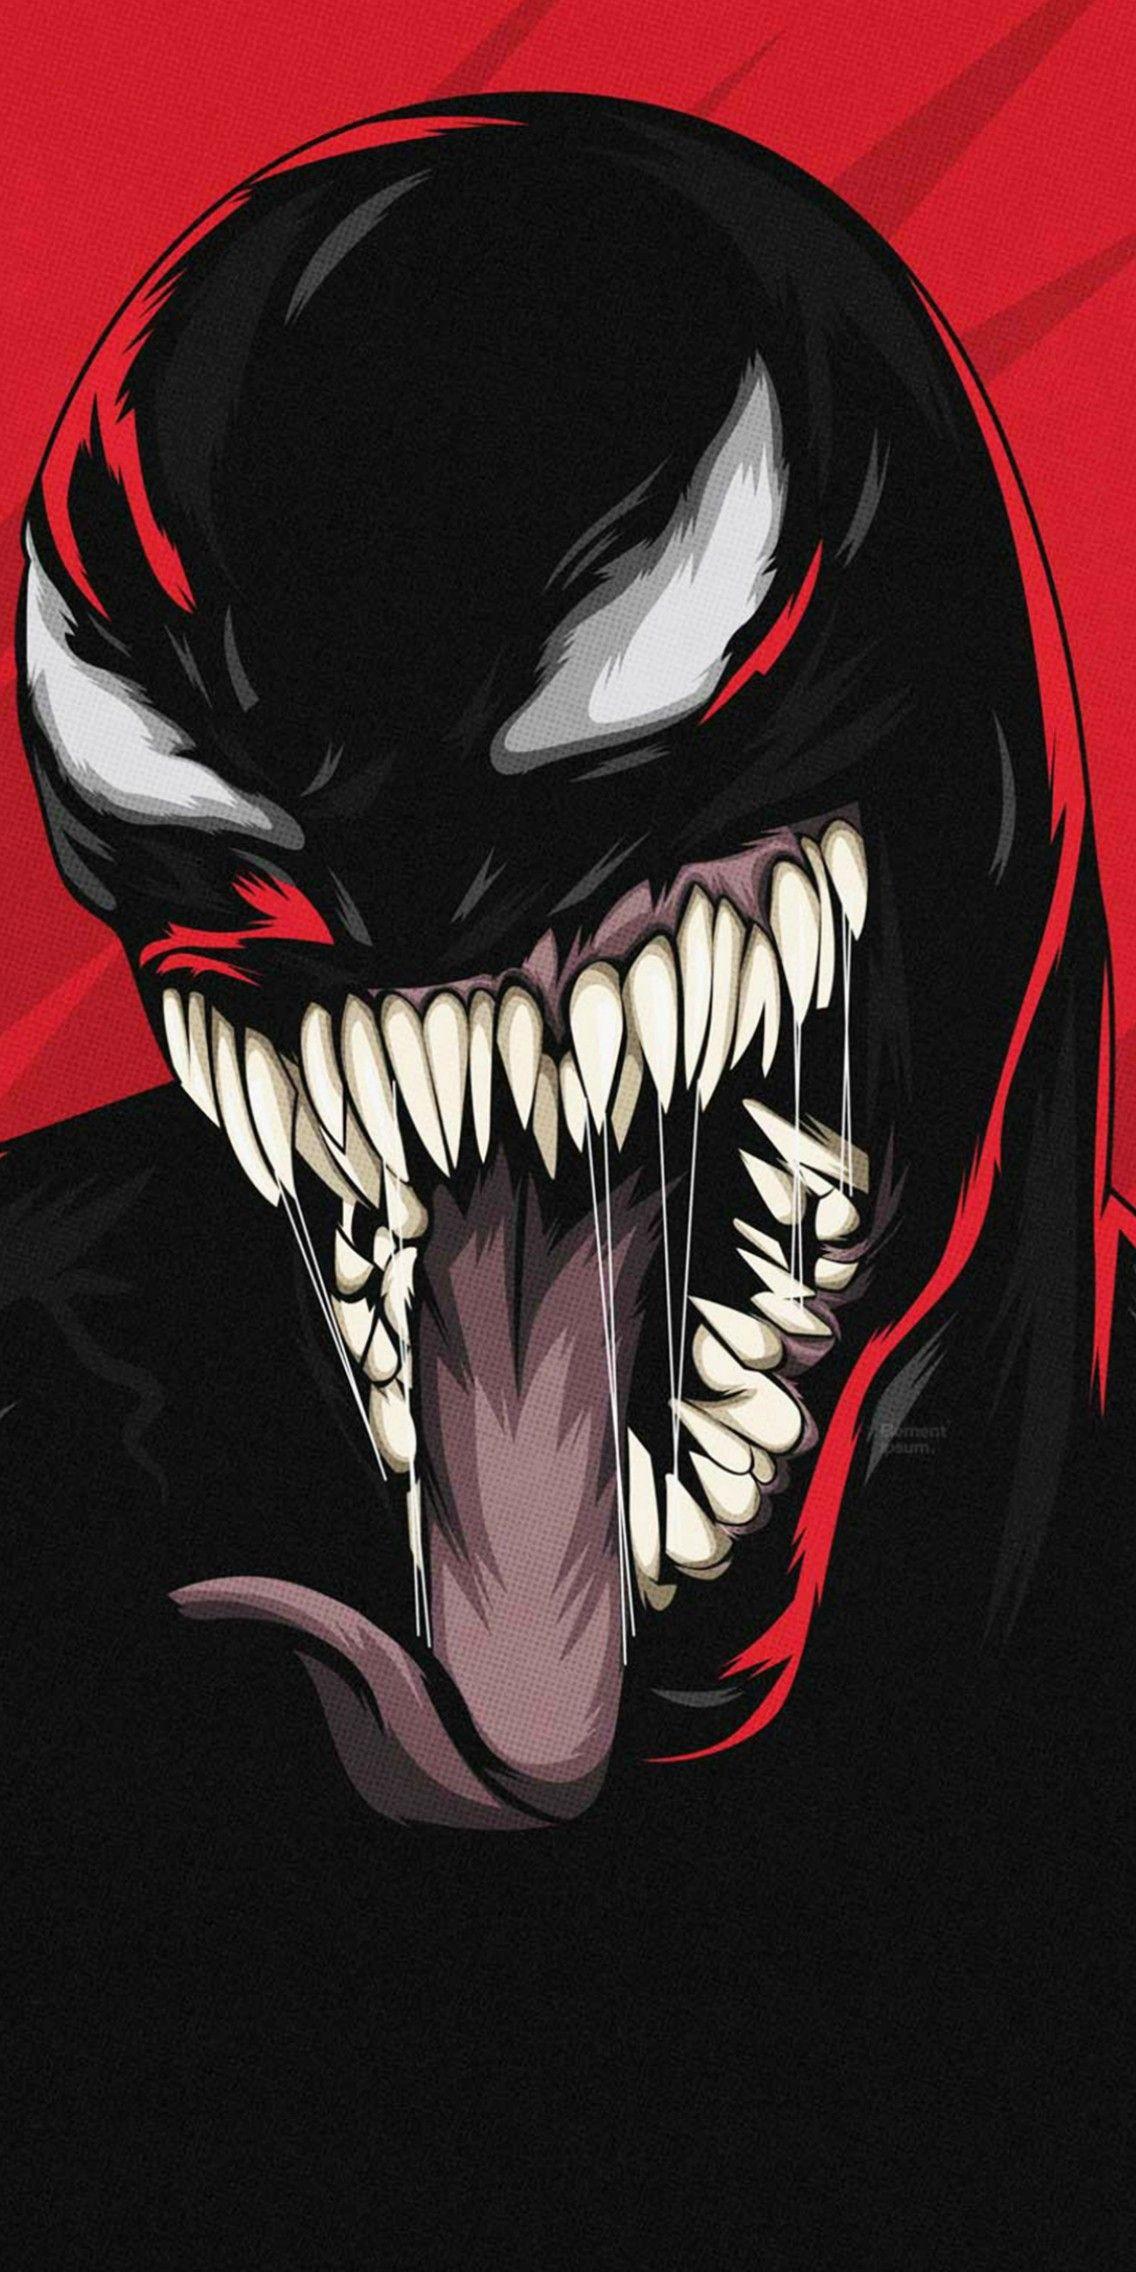 Pin Oleh Somon Di Venom Dengan Gambar